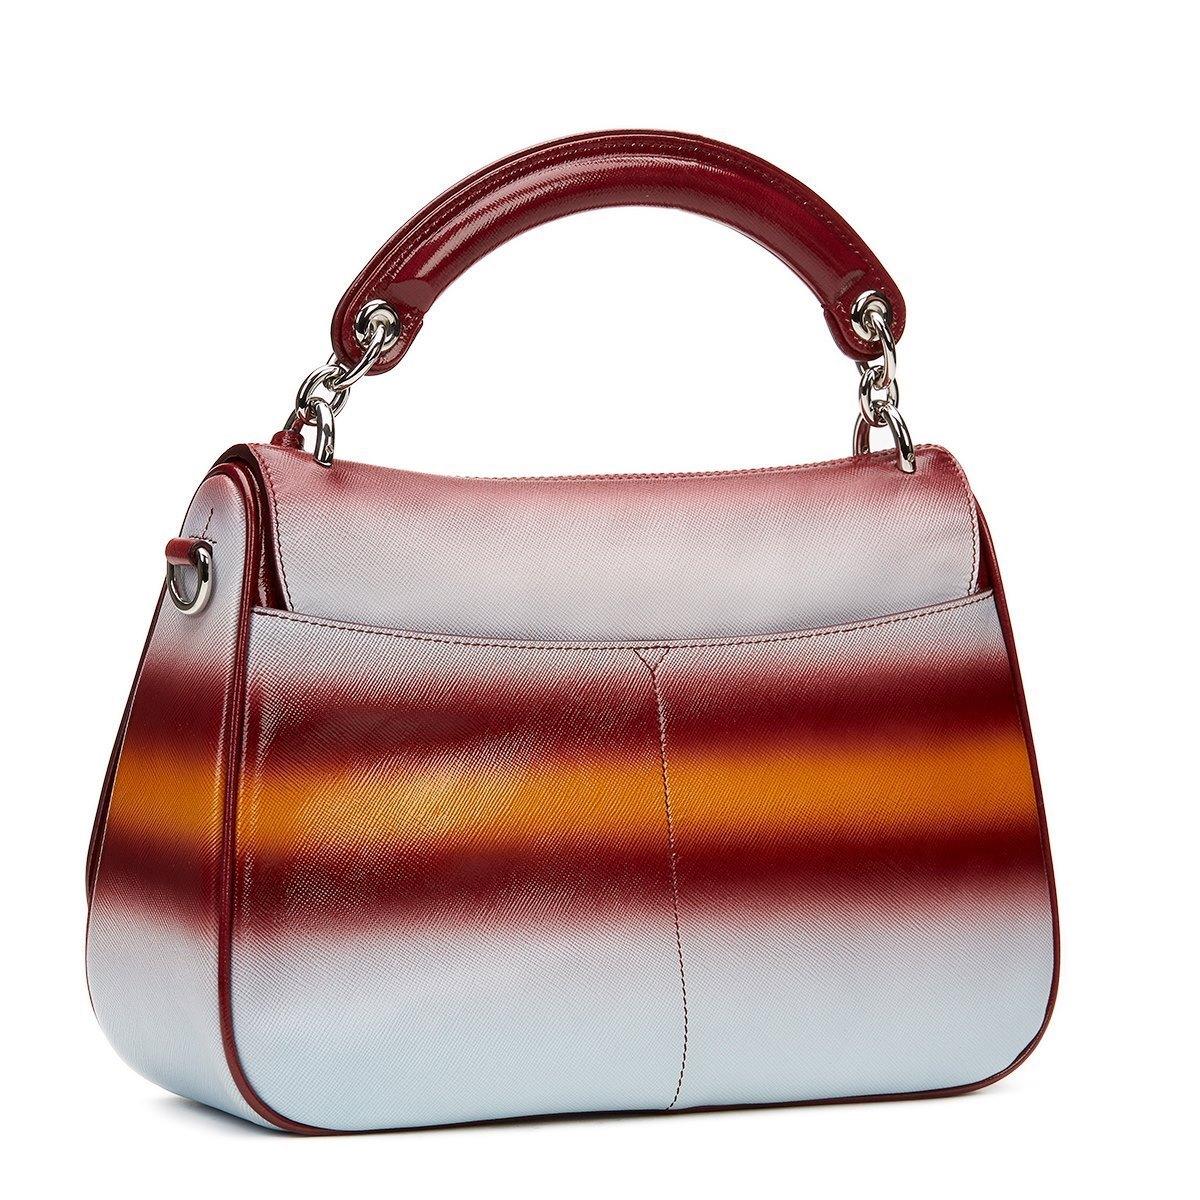 Dior Maroon Mustard And Blue Gradient Grained Calfskin Dune Bag 2015s sjBYp